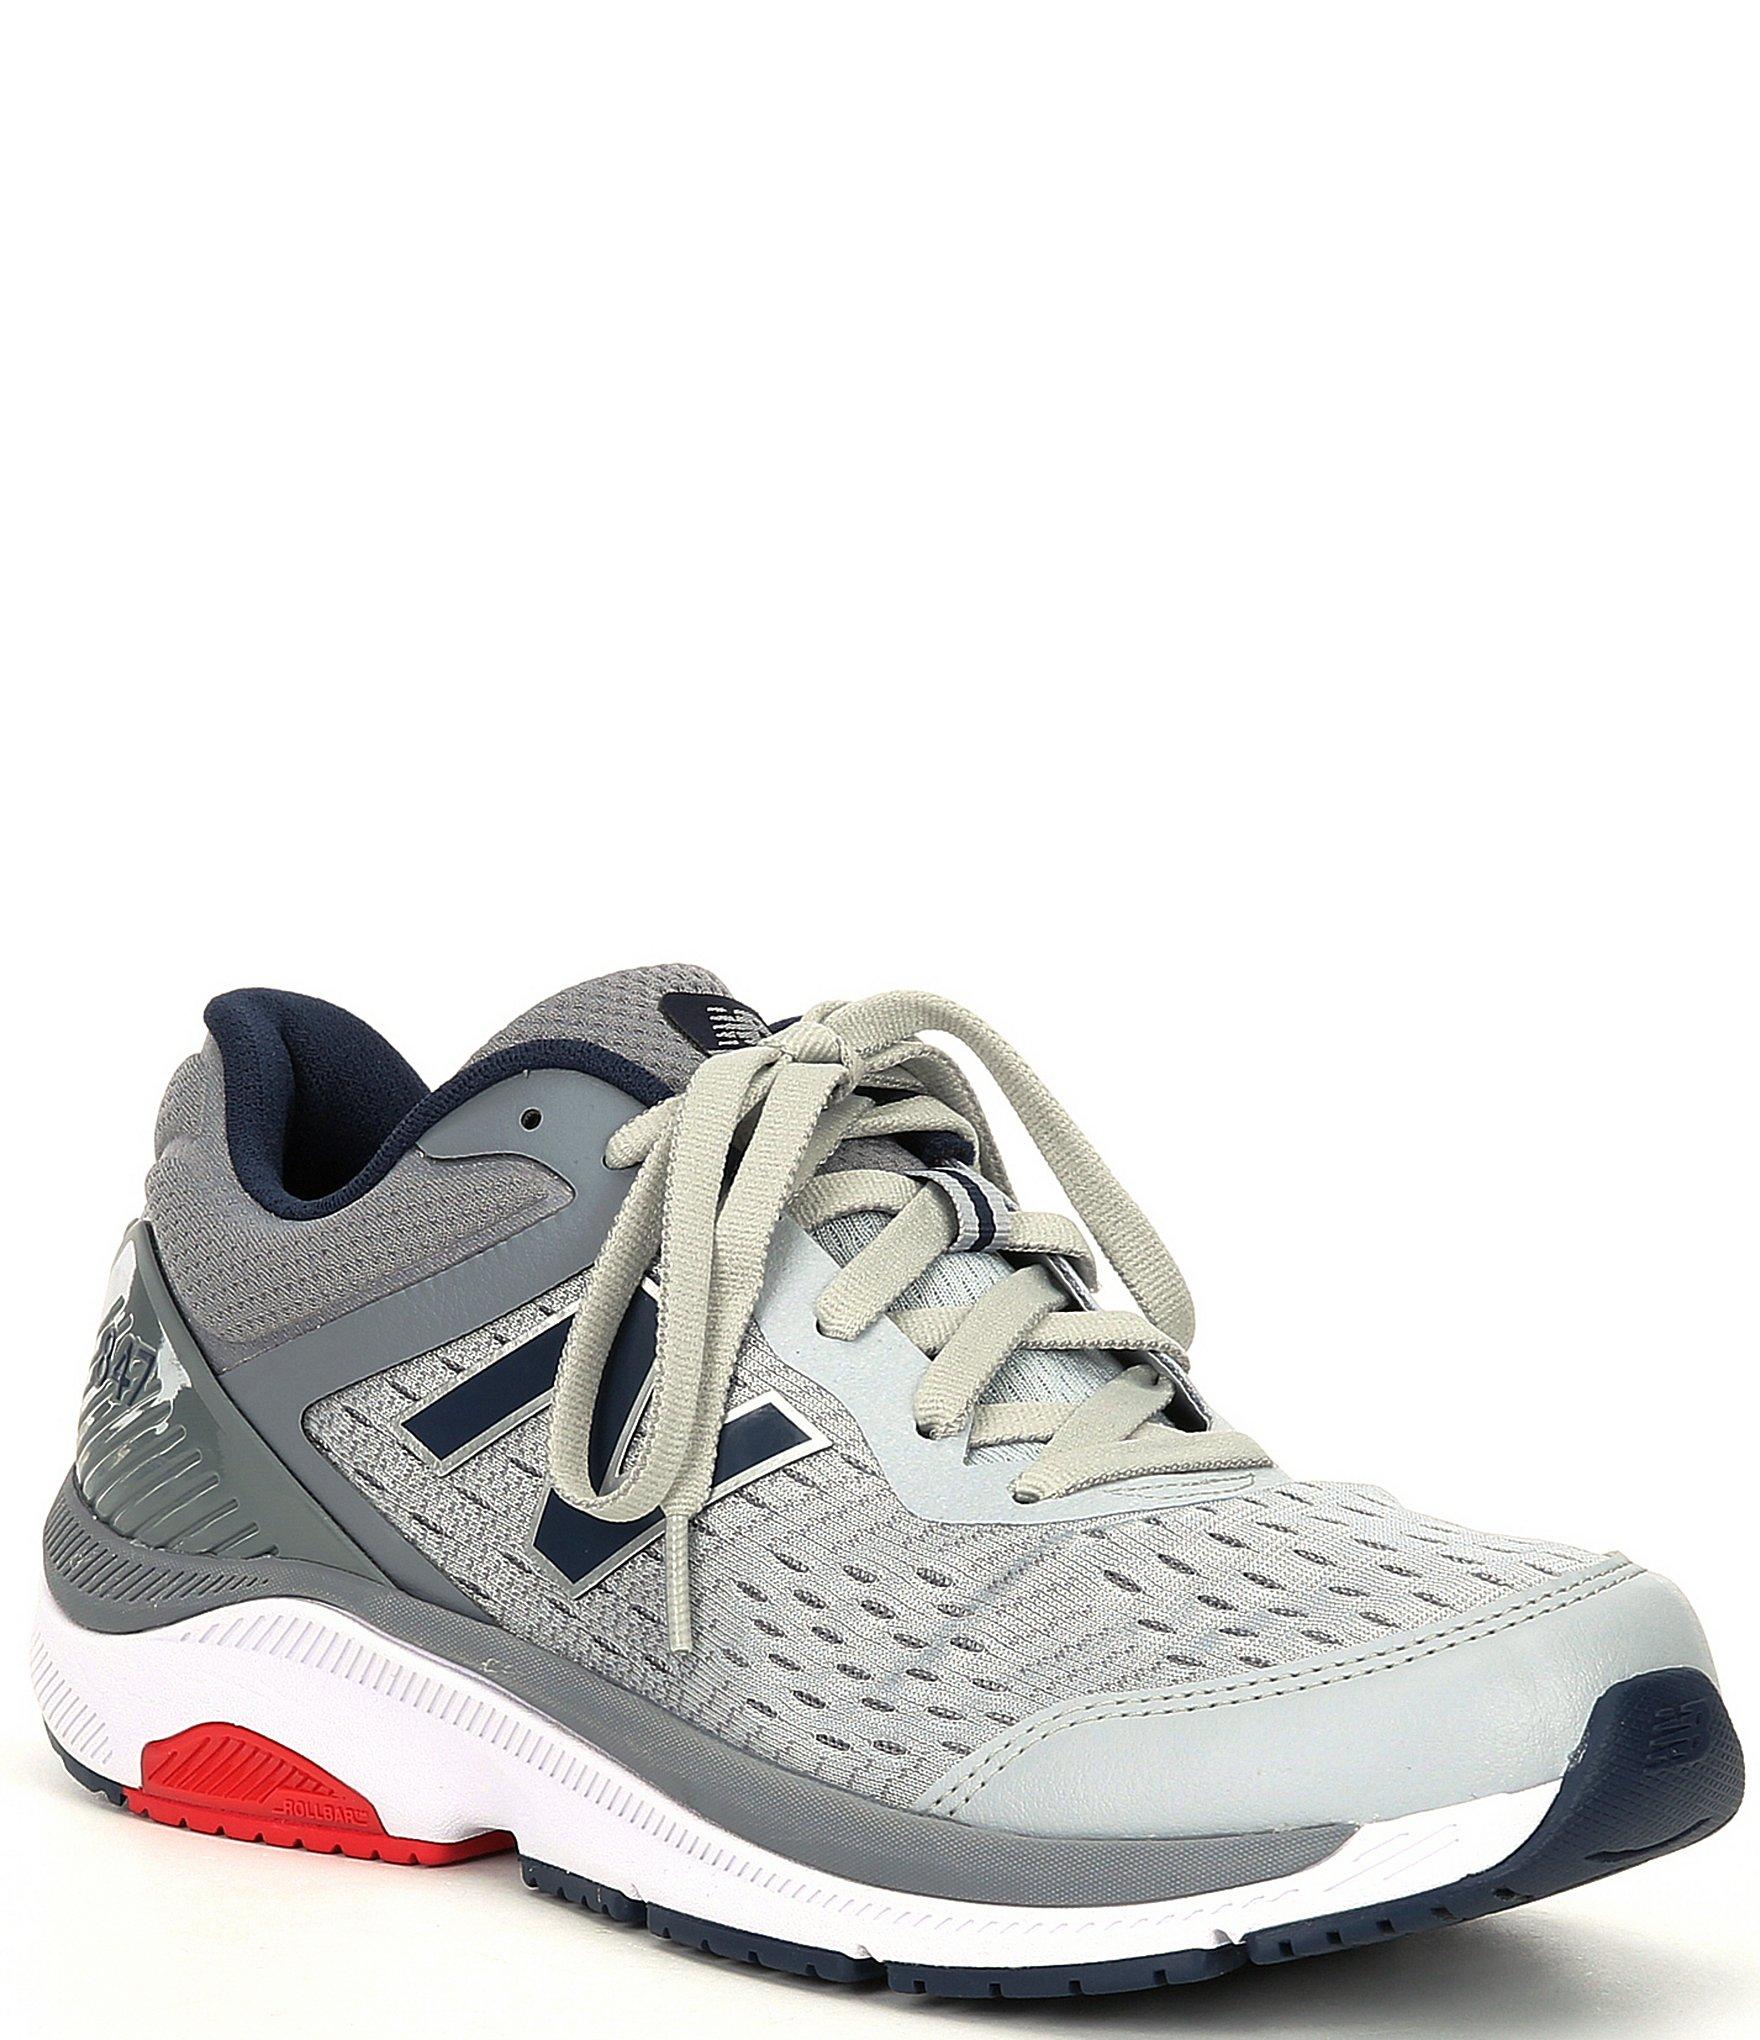 847 V4 Lace-Up Walking Shoes